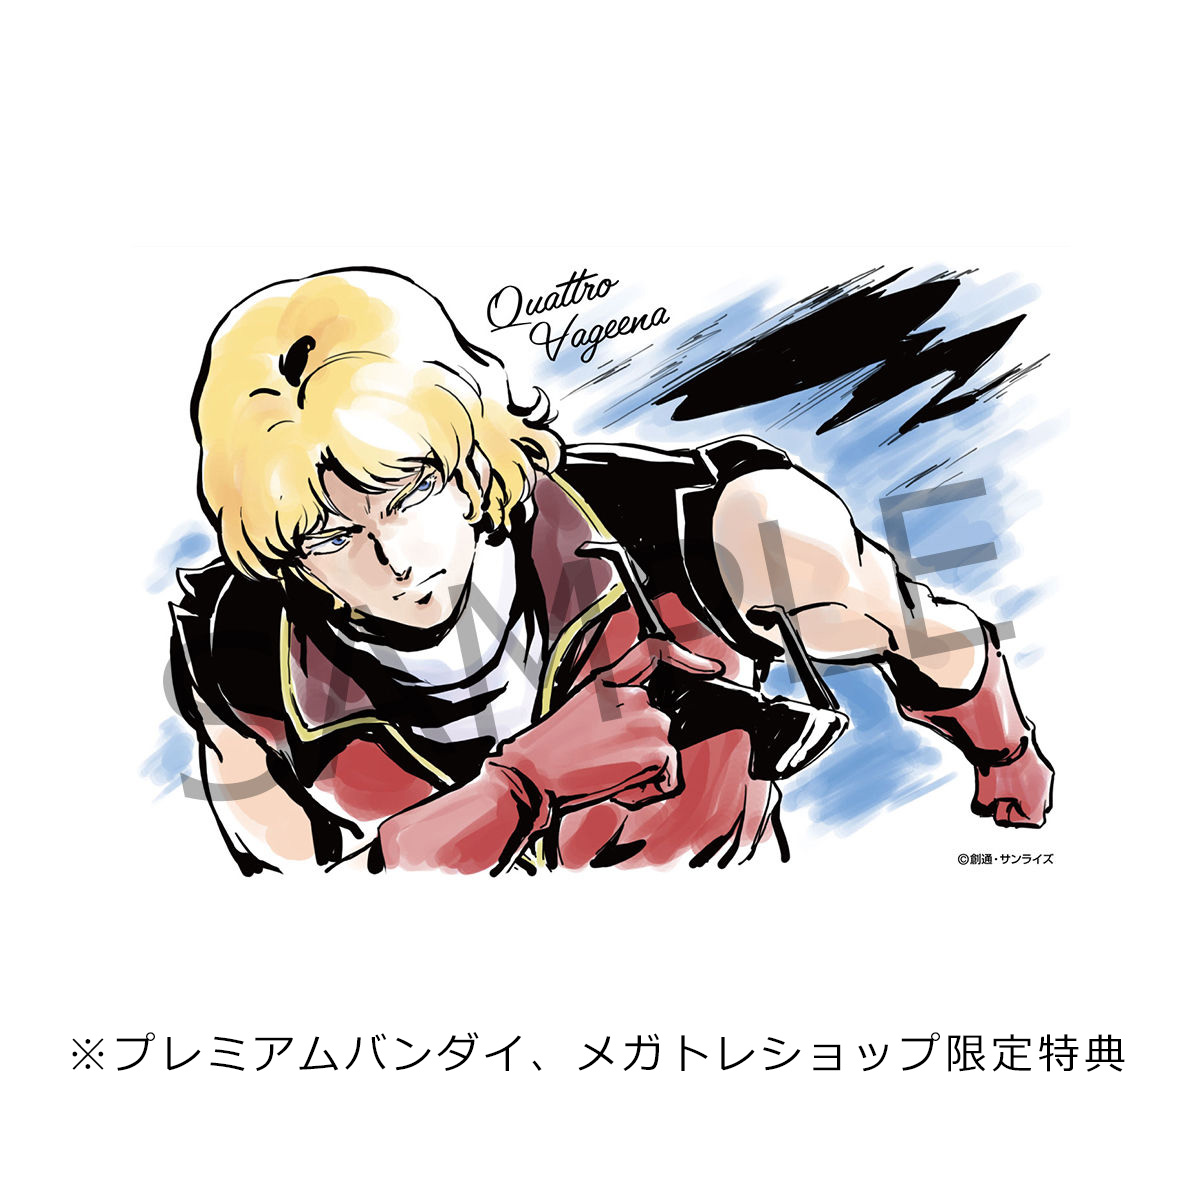 GGG『クワトロ・バジーナ』機動戦士Zガンダム  1/8 完成品フィギュア-010